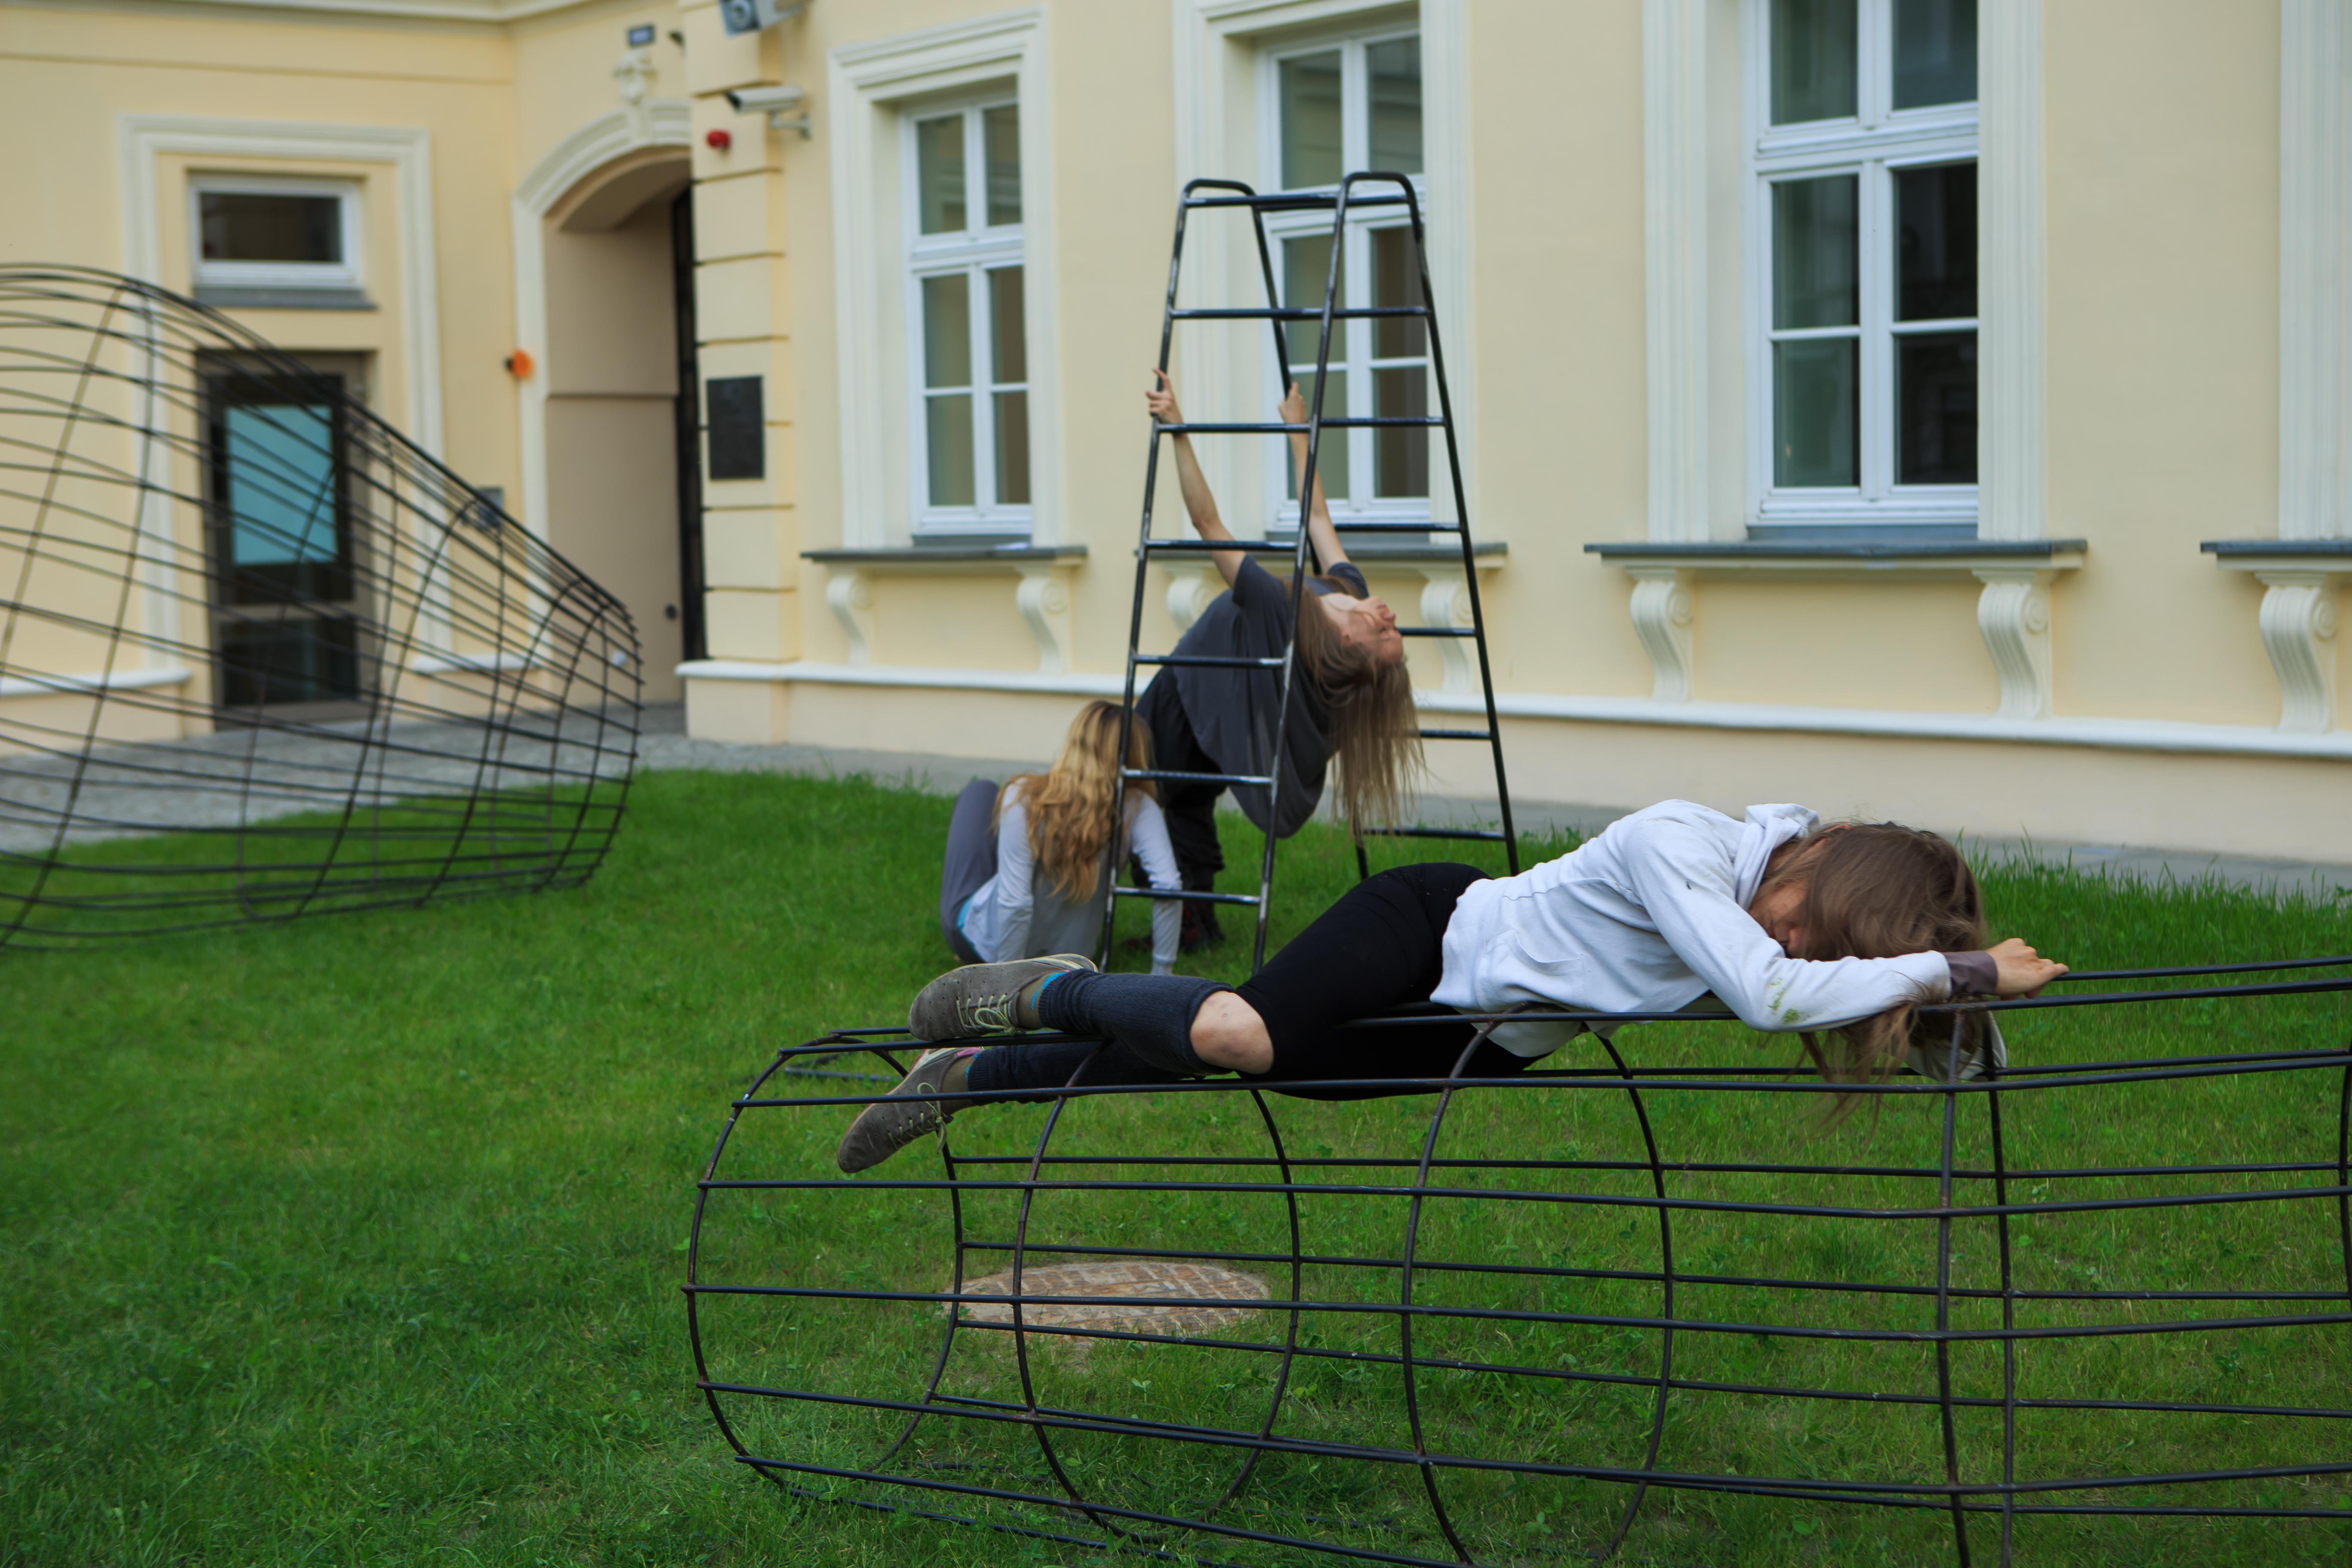 Eva Kotátková, Architektura snu / Architecture of sleep, fot.Maciek Niećko